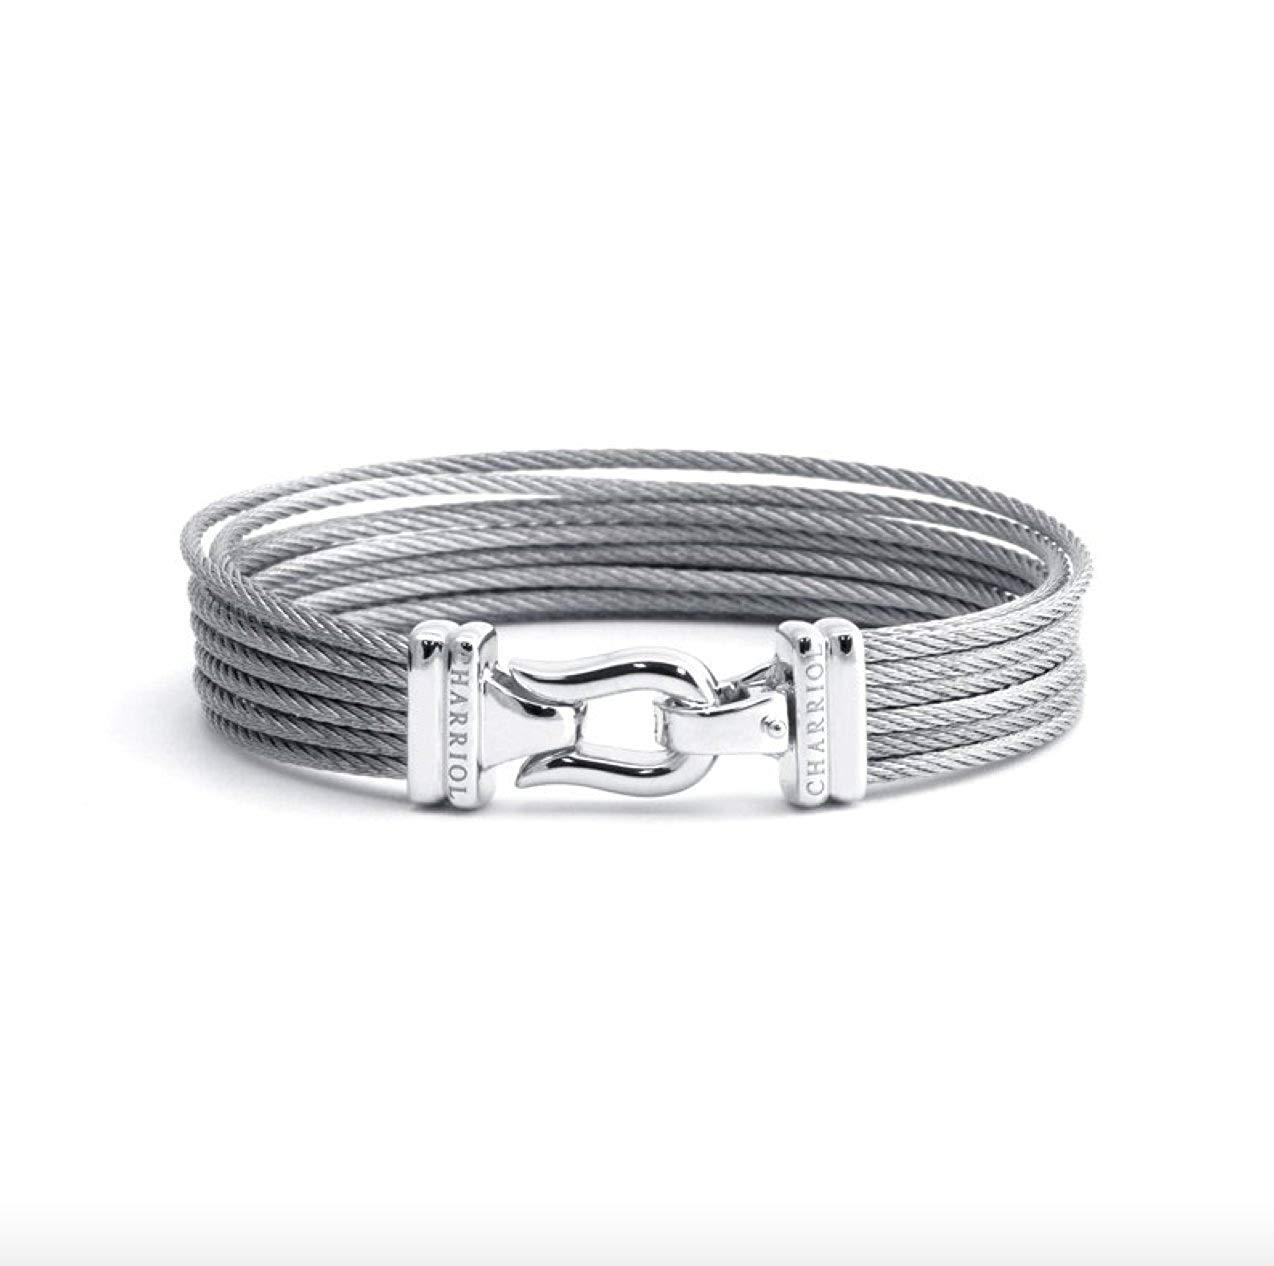 bbf41ae90e3 Cheap charriol jewelry find charriol jewelry deals on line jpg 1274x1266  Charriol bracelets women leather